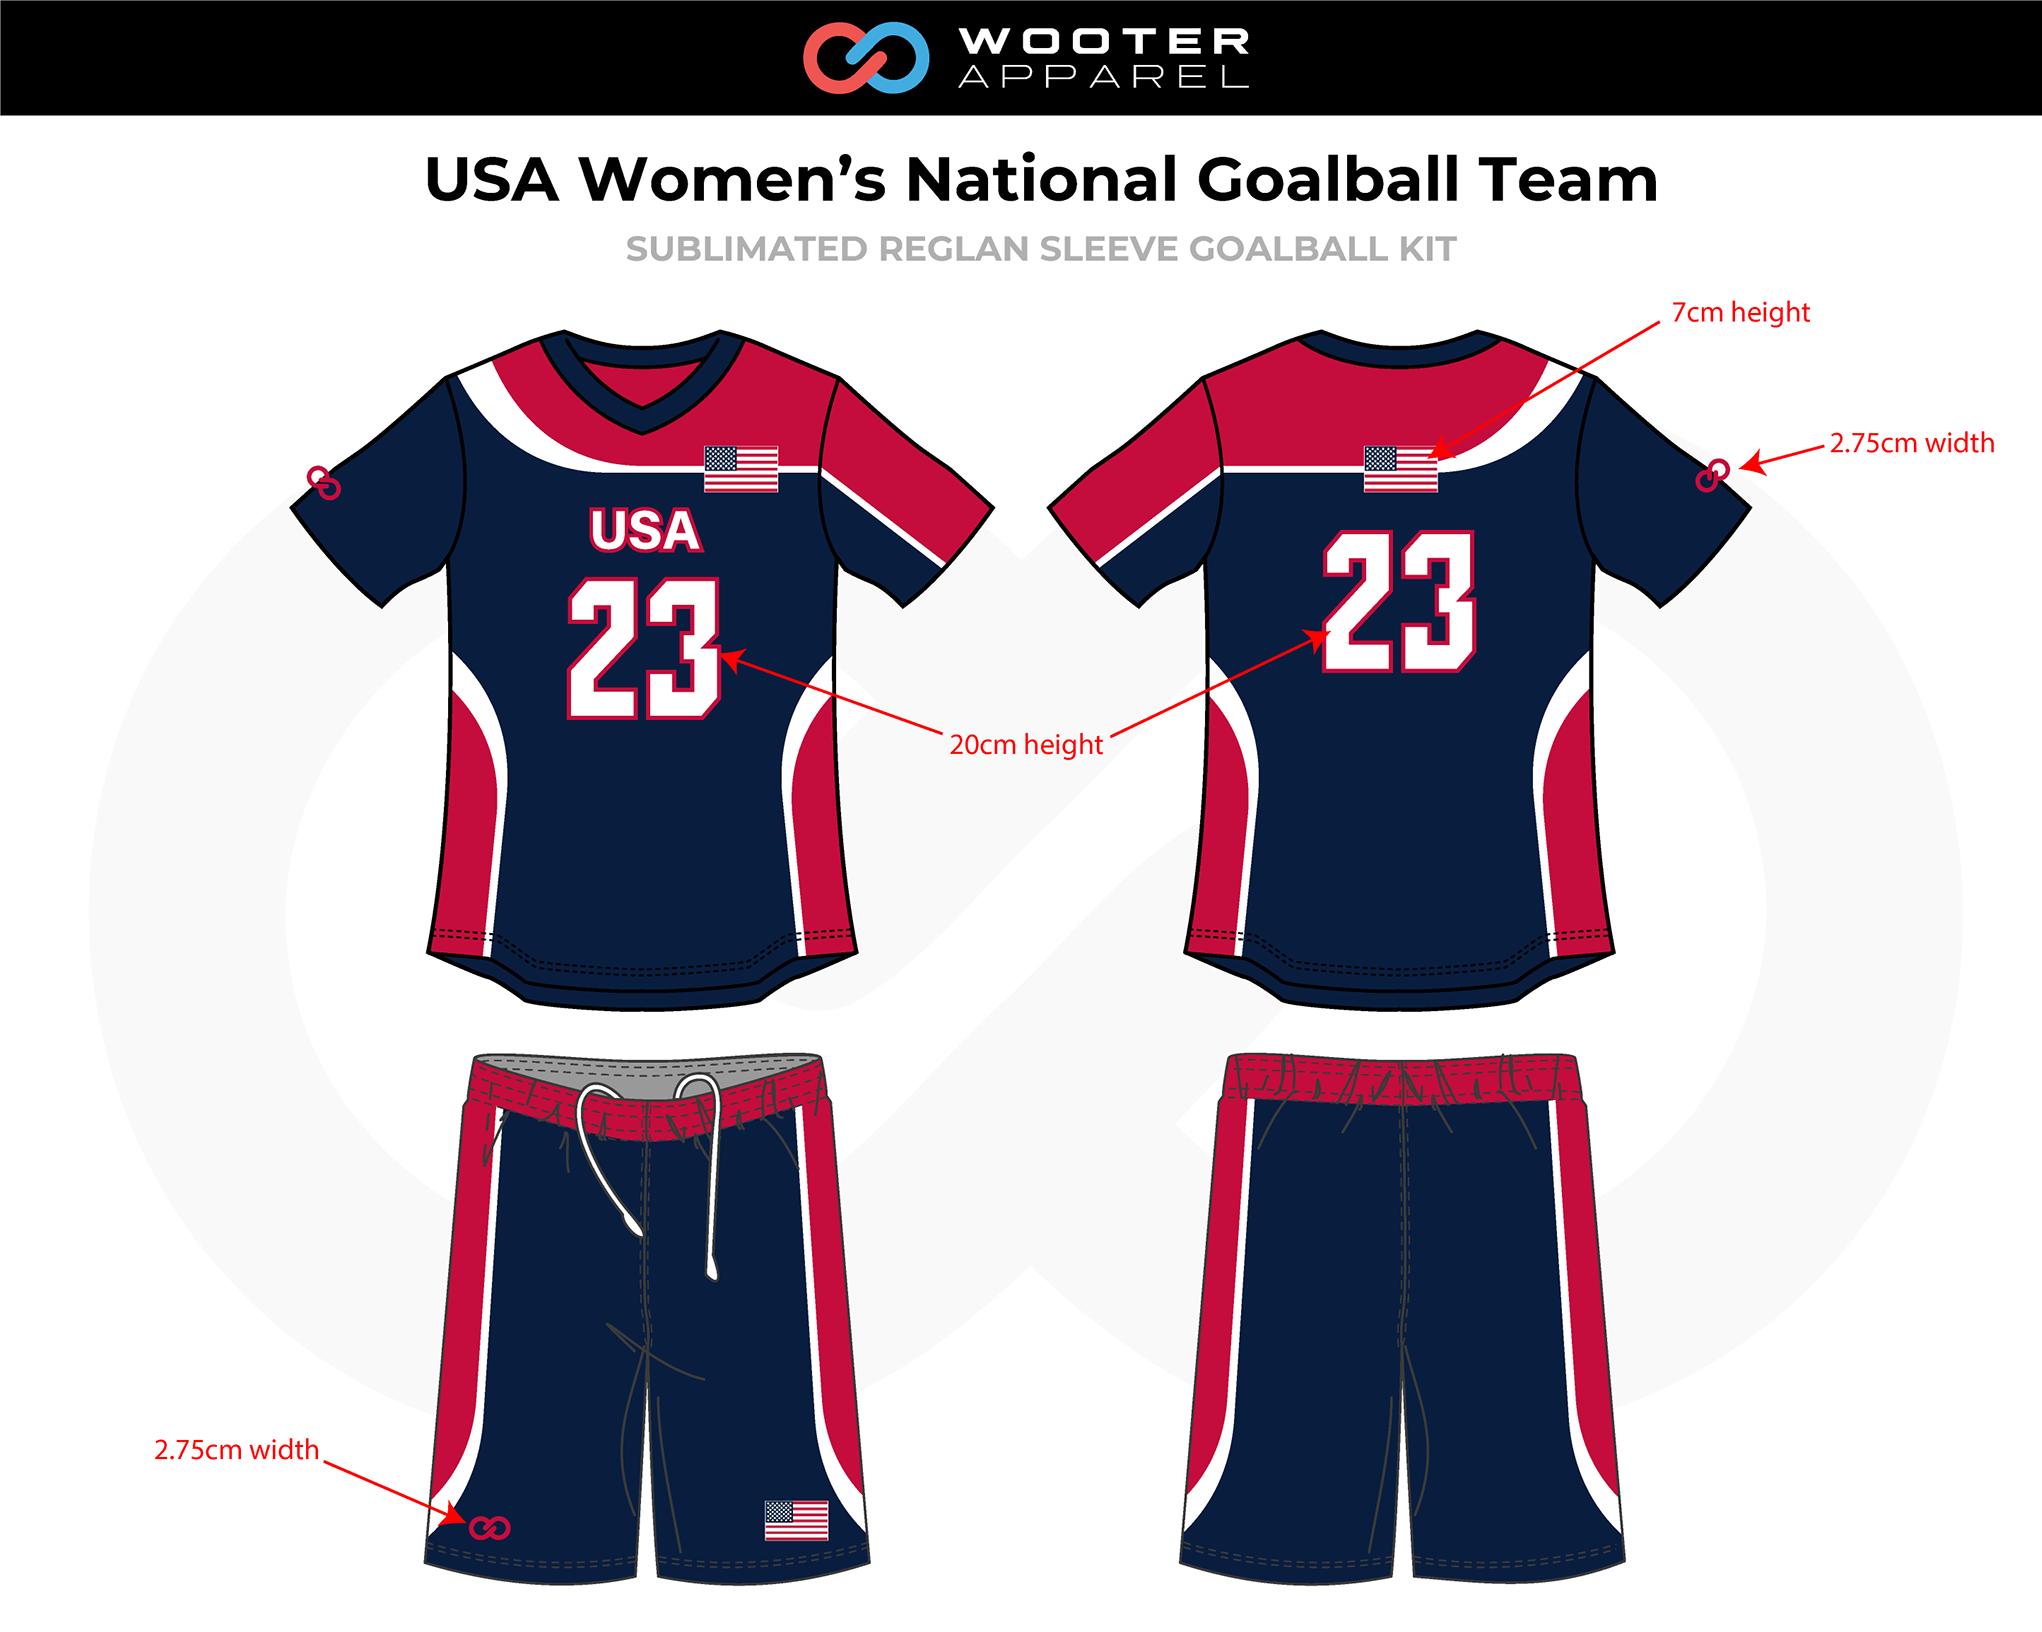 2019-01-09 USA Women's National Goalball Uniform (Option 2).png